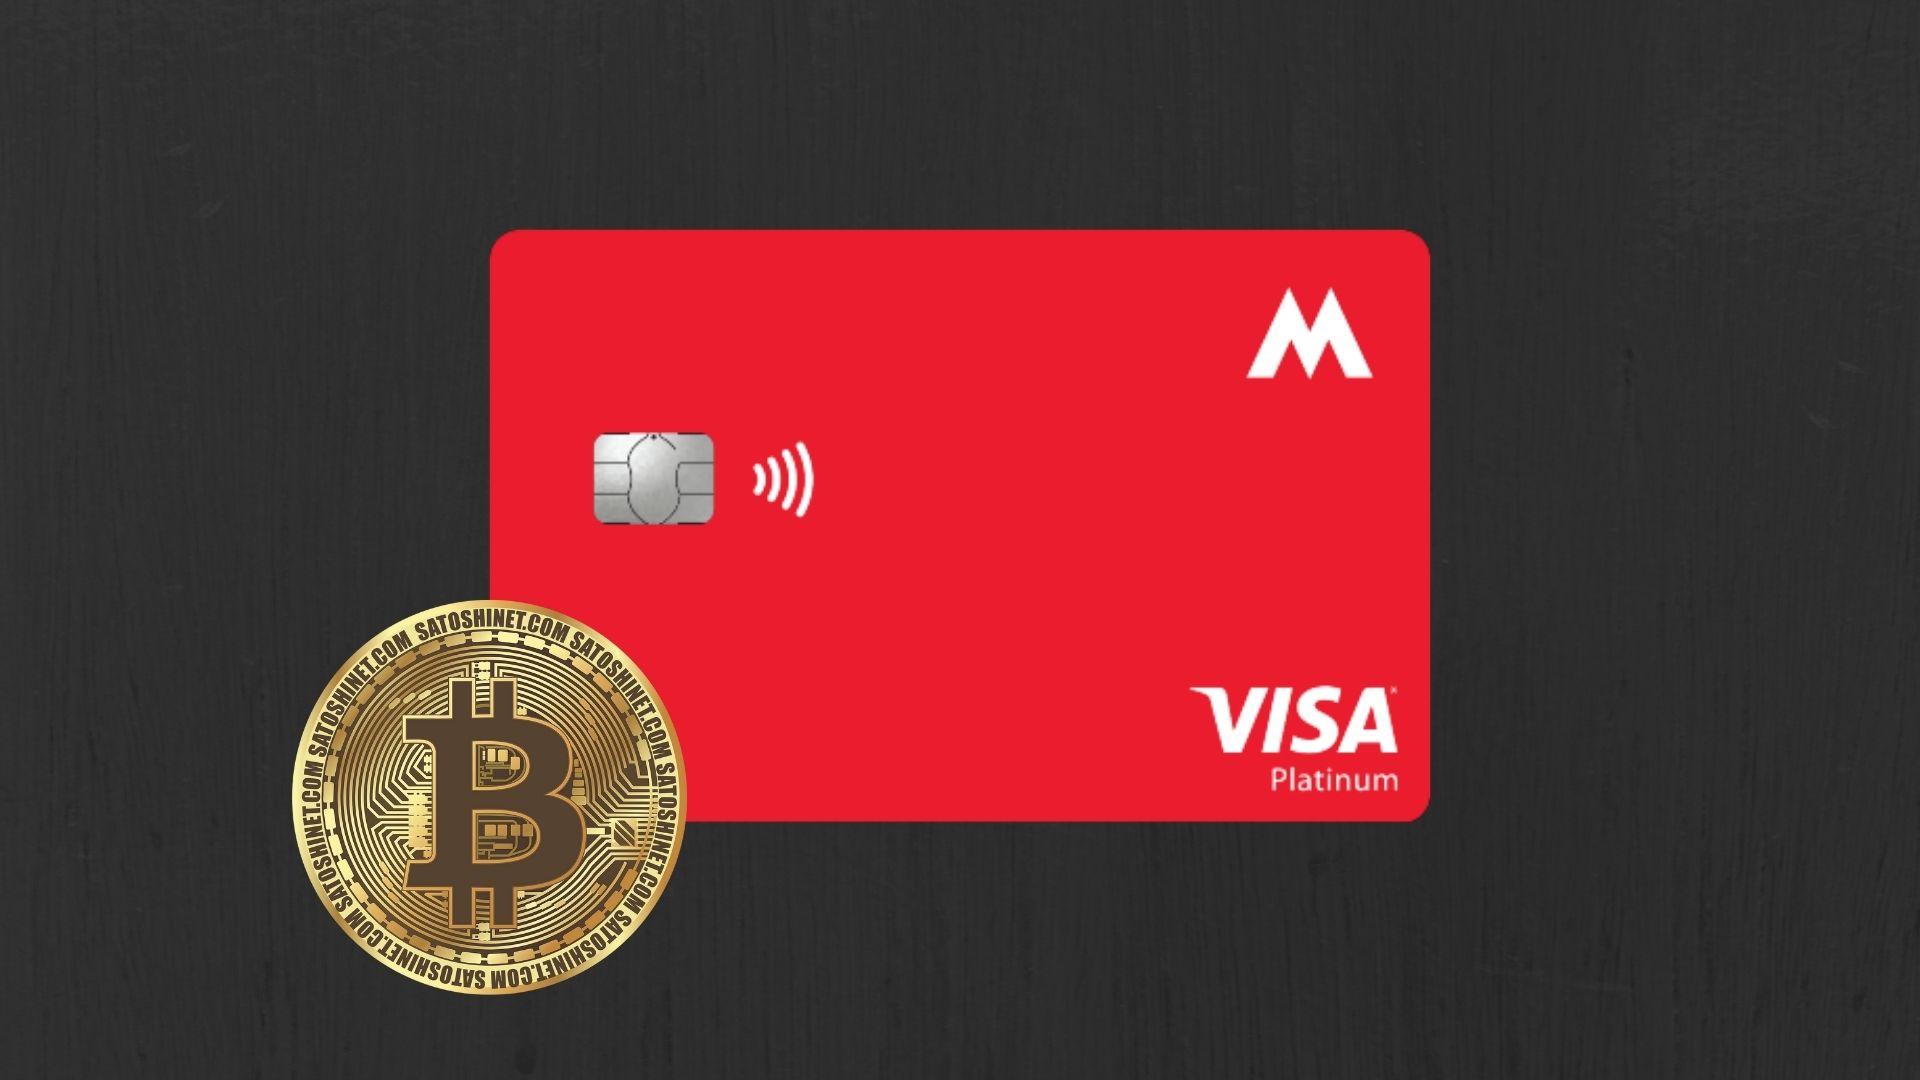 Mogo Bitcoin cahsback card discontinued